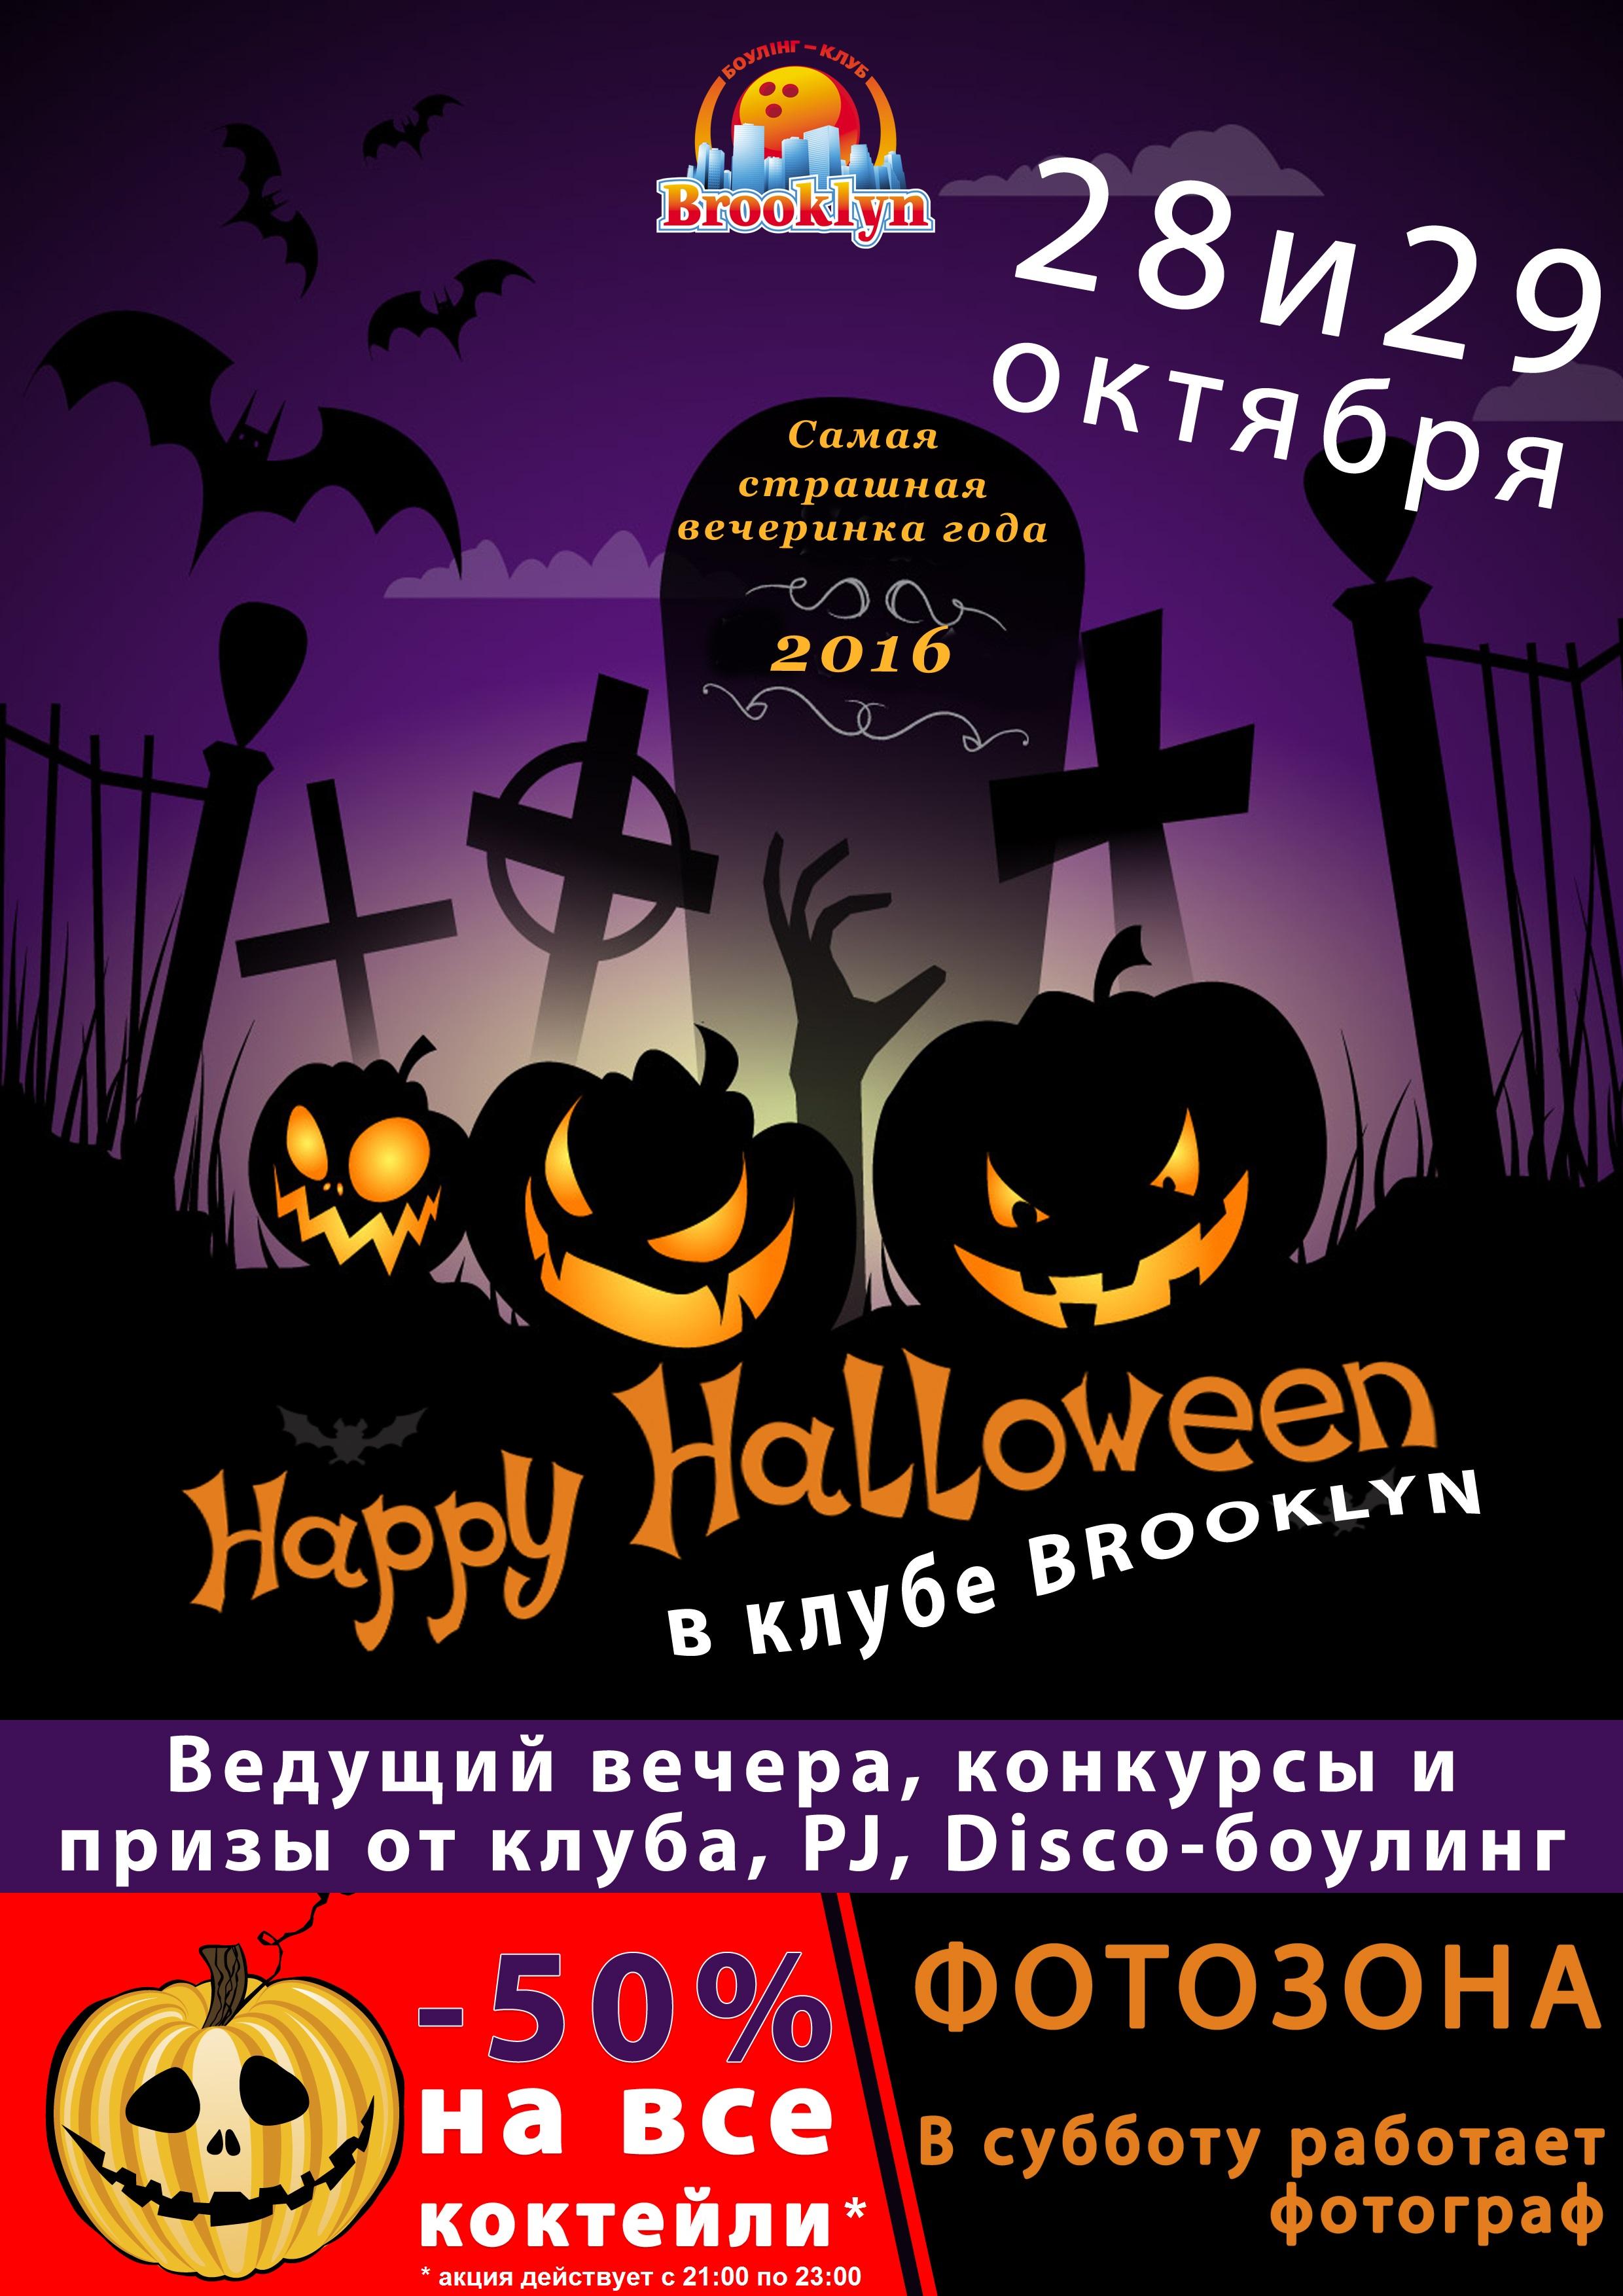 Хэллоуин 2016 в клубе Бруклин